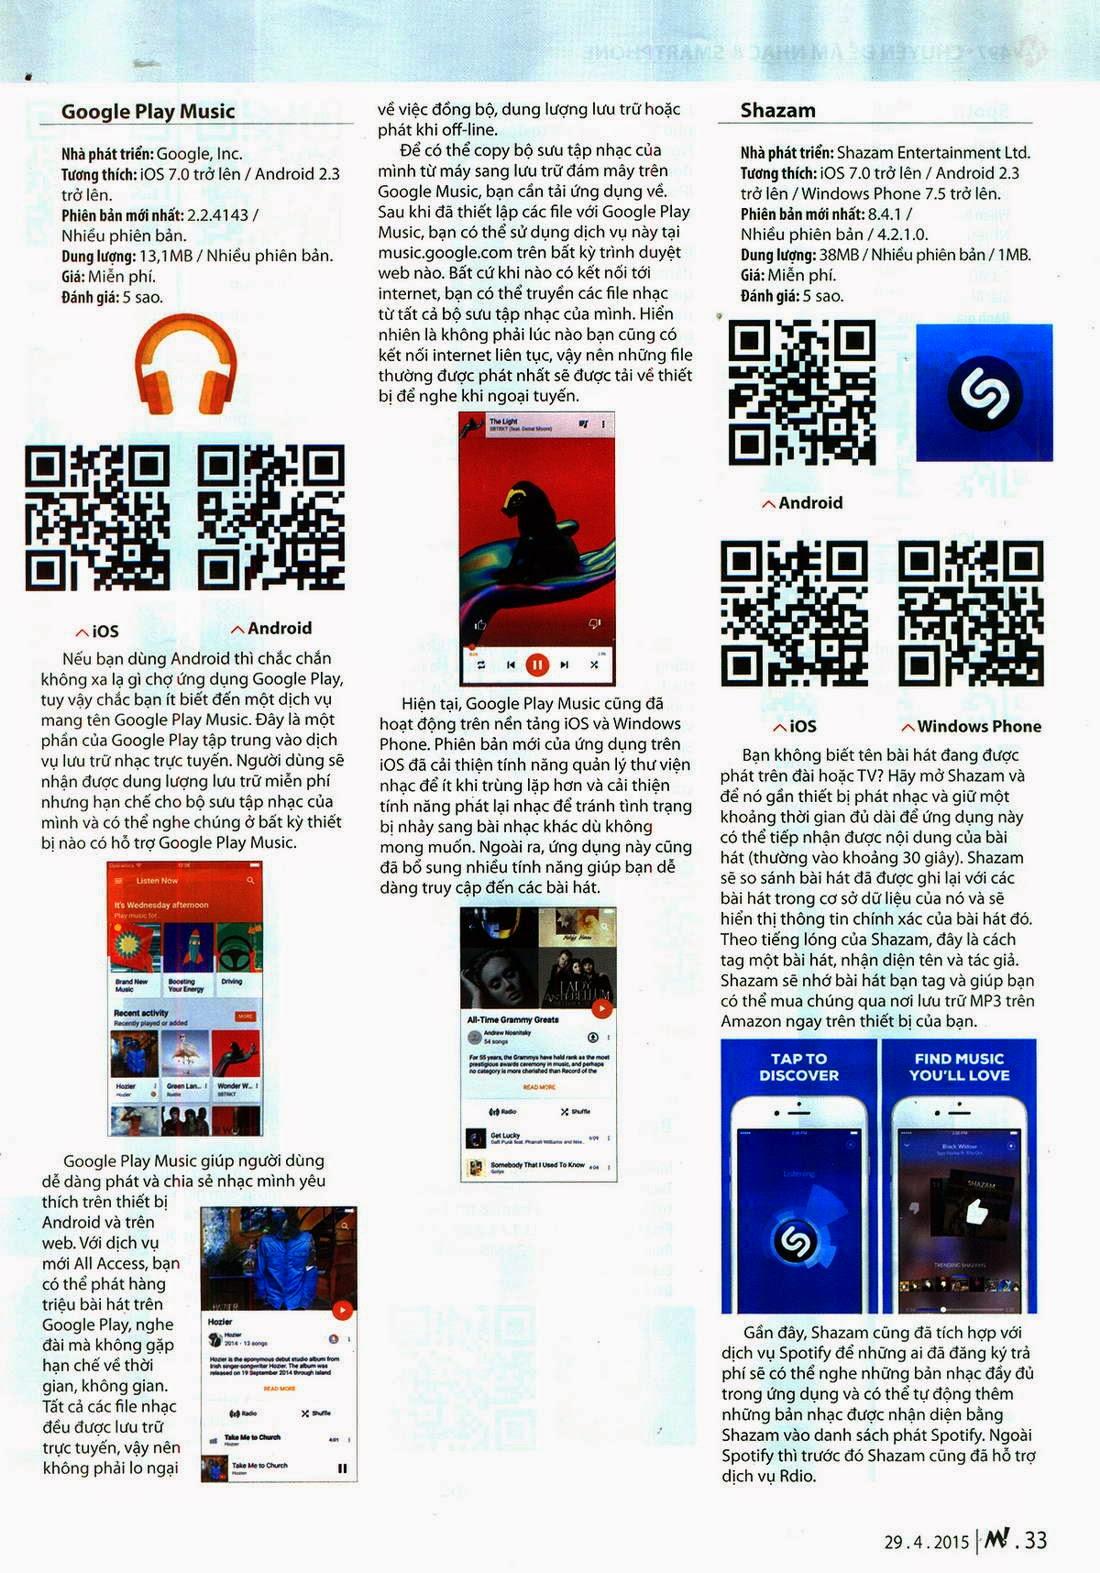 EChip Mobile 497 tapchicntt.com